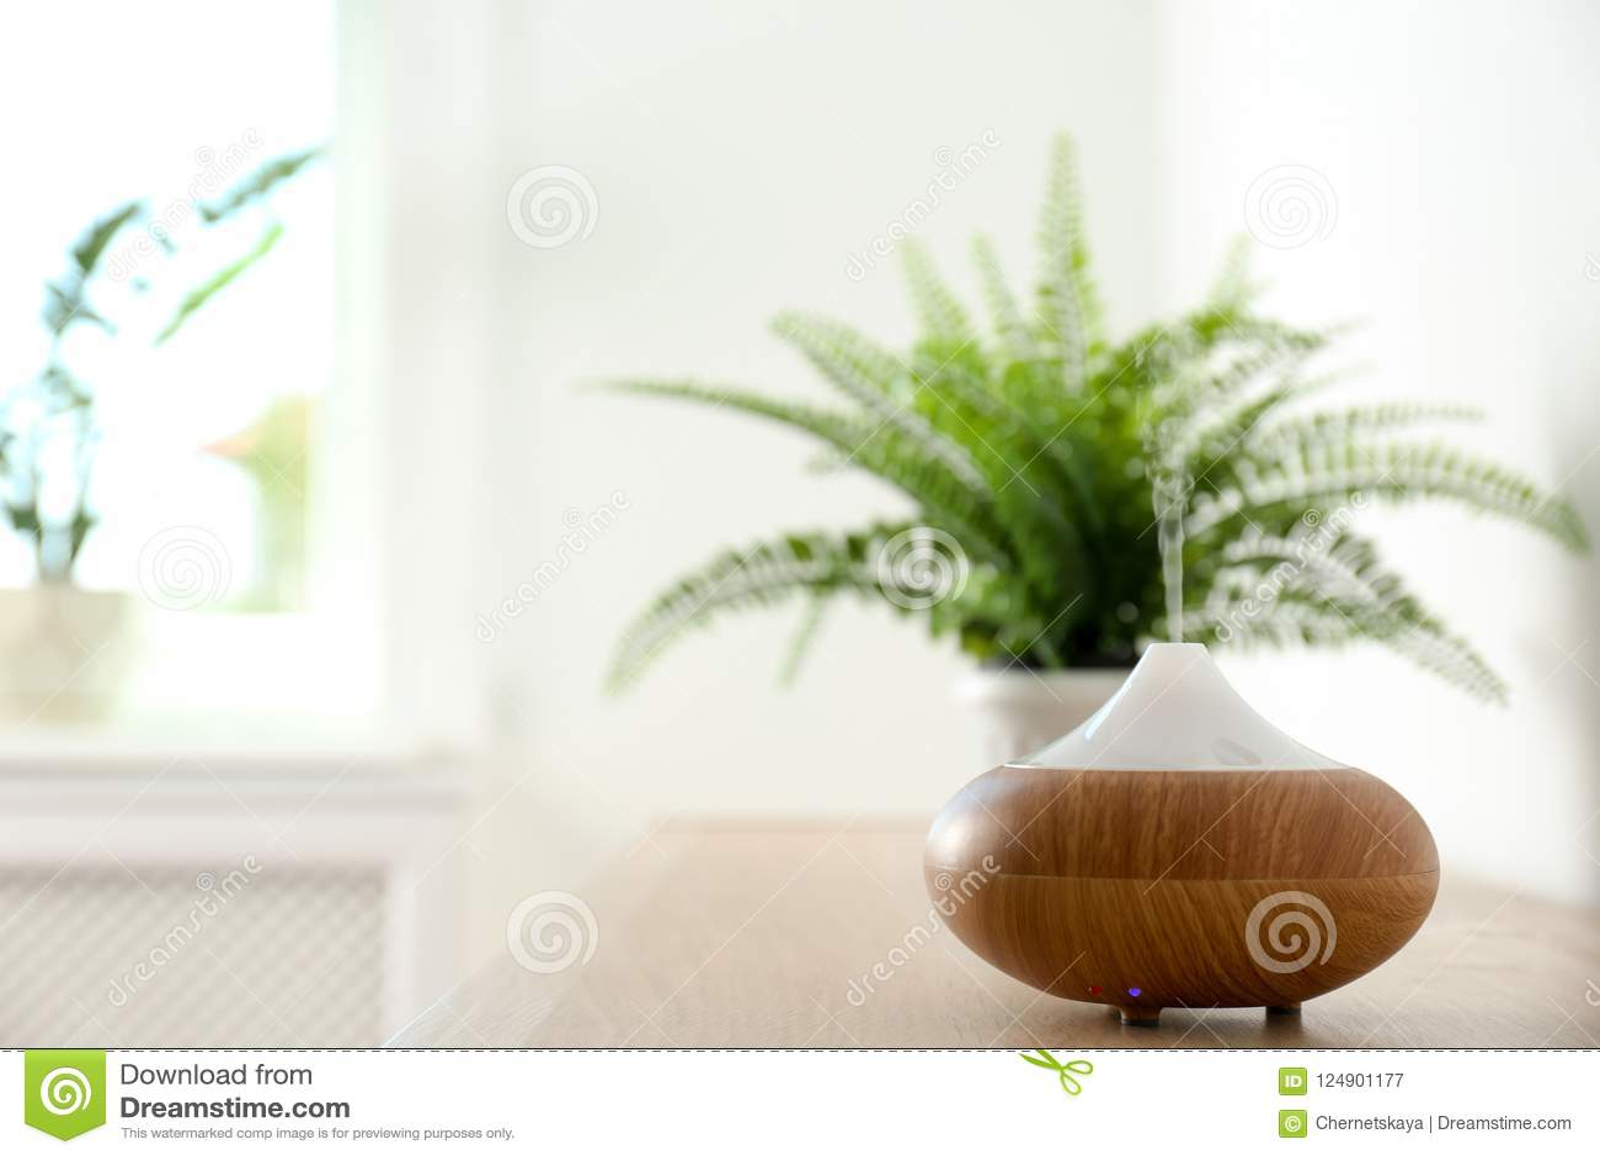 Modern aroma lamp on table